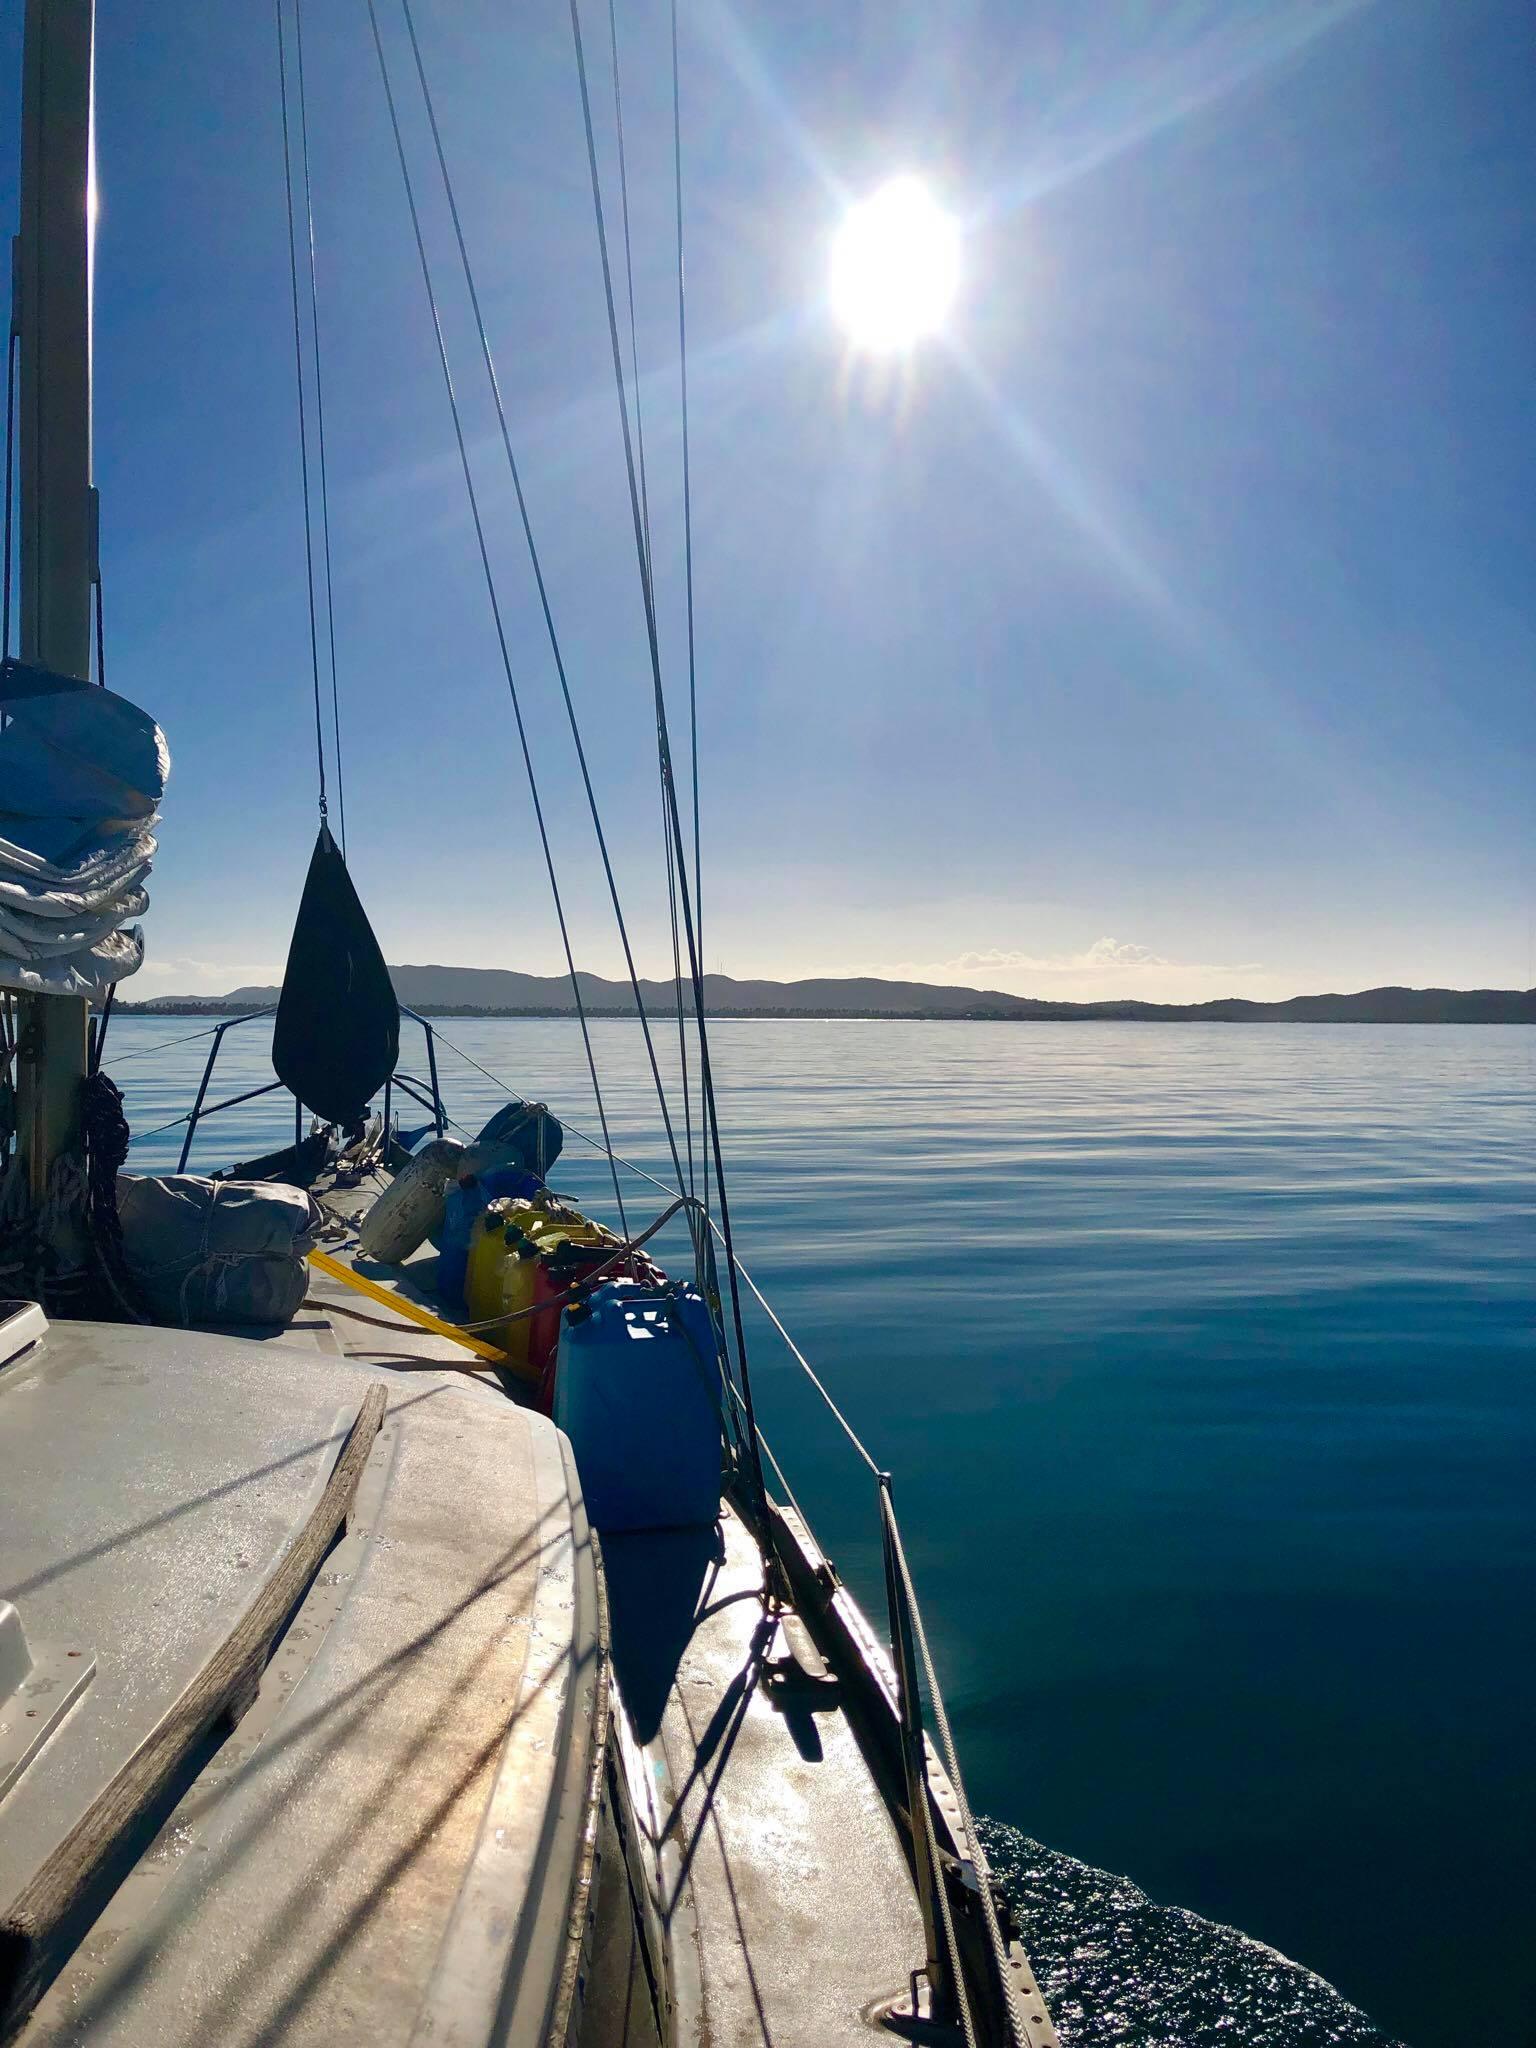 Sailing Life Day 309 Sailing (actually motoring) from Puerto Real to Boqueron, Puerto Rico4.jpg